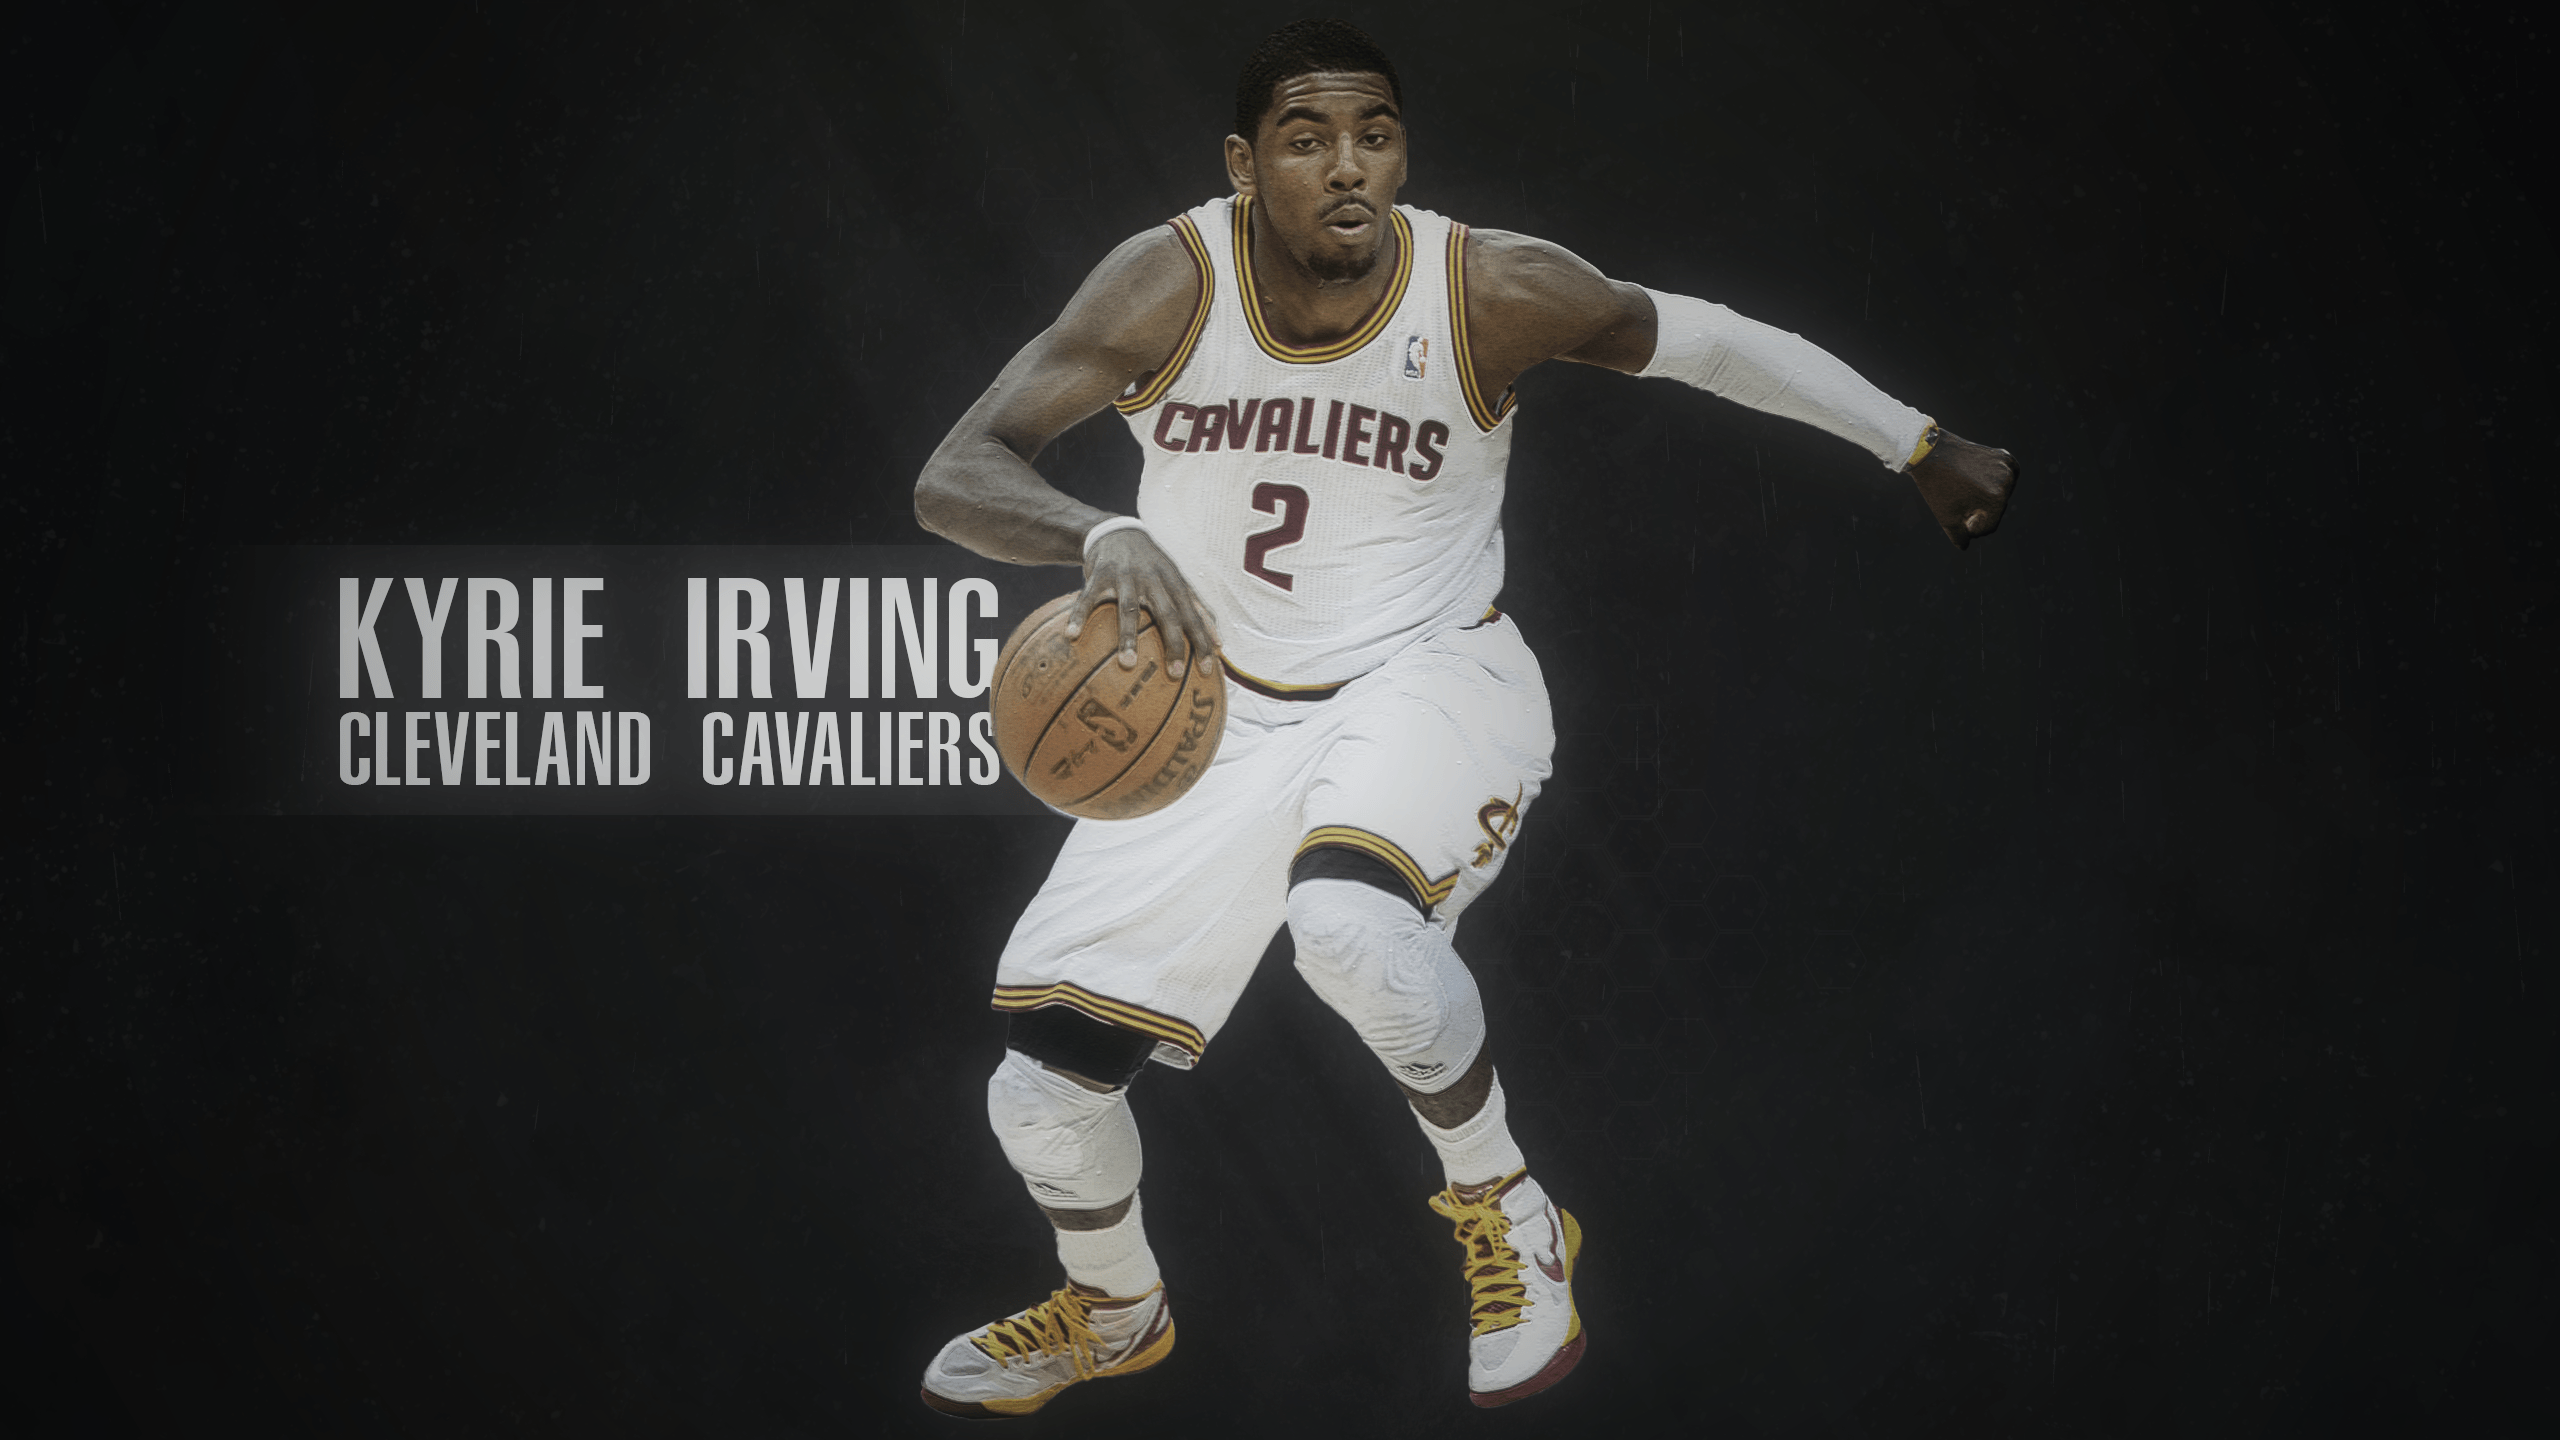 Kyrie Irving Basketball Wallpapers - Wallpaper CaveKyrie Irving Wallpaper